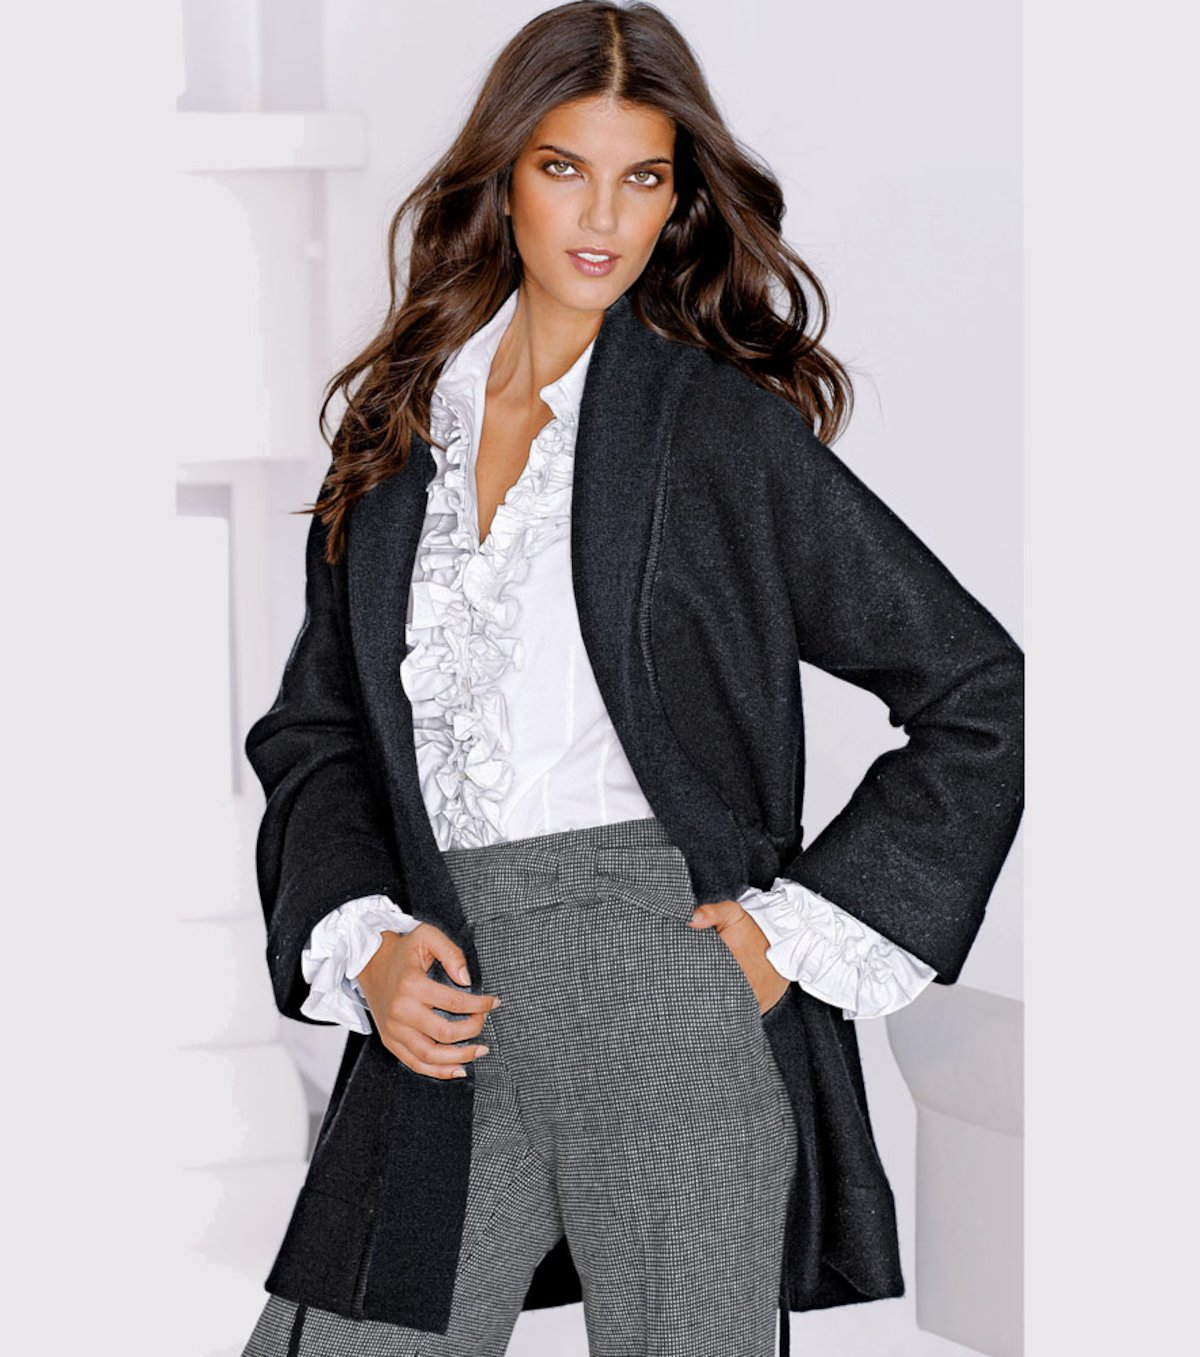 nueva llegada 3c151 71c0f Chaqueta abrigo mujer de punto tricot